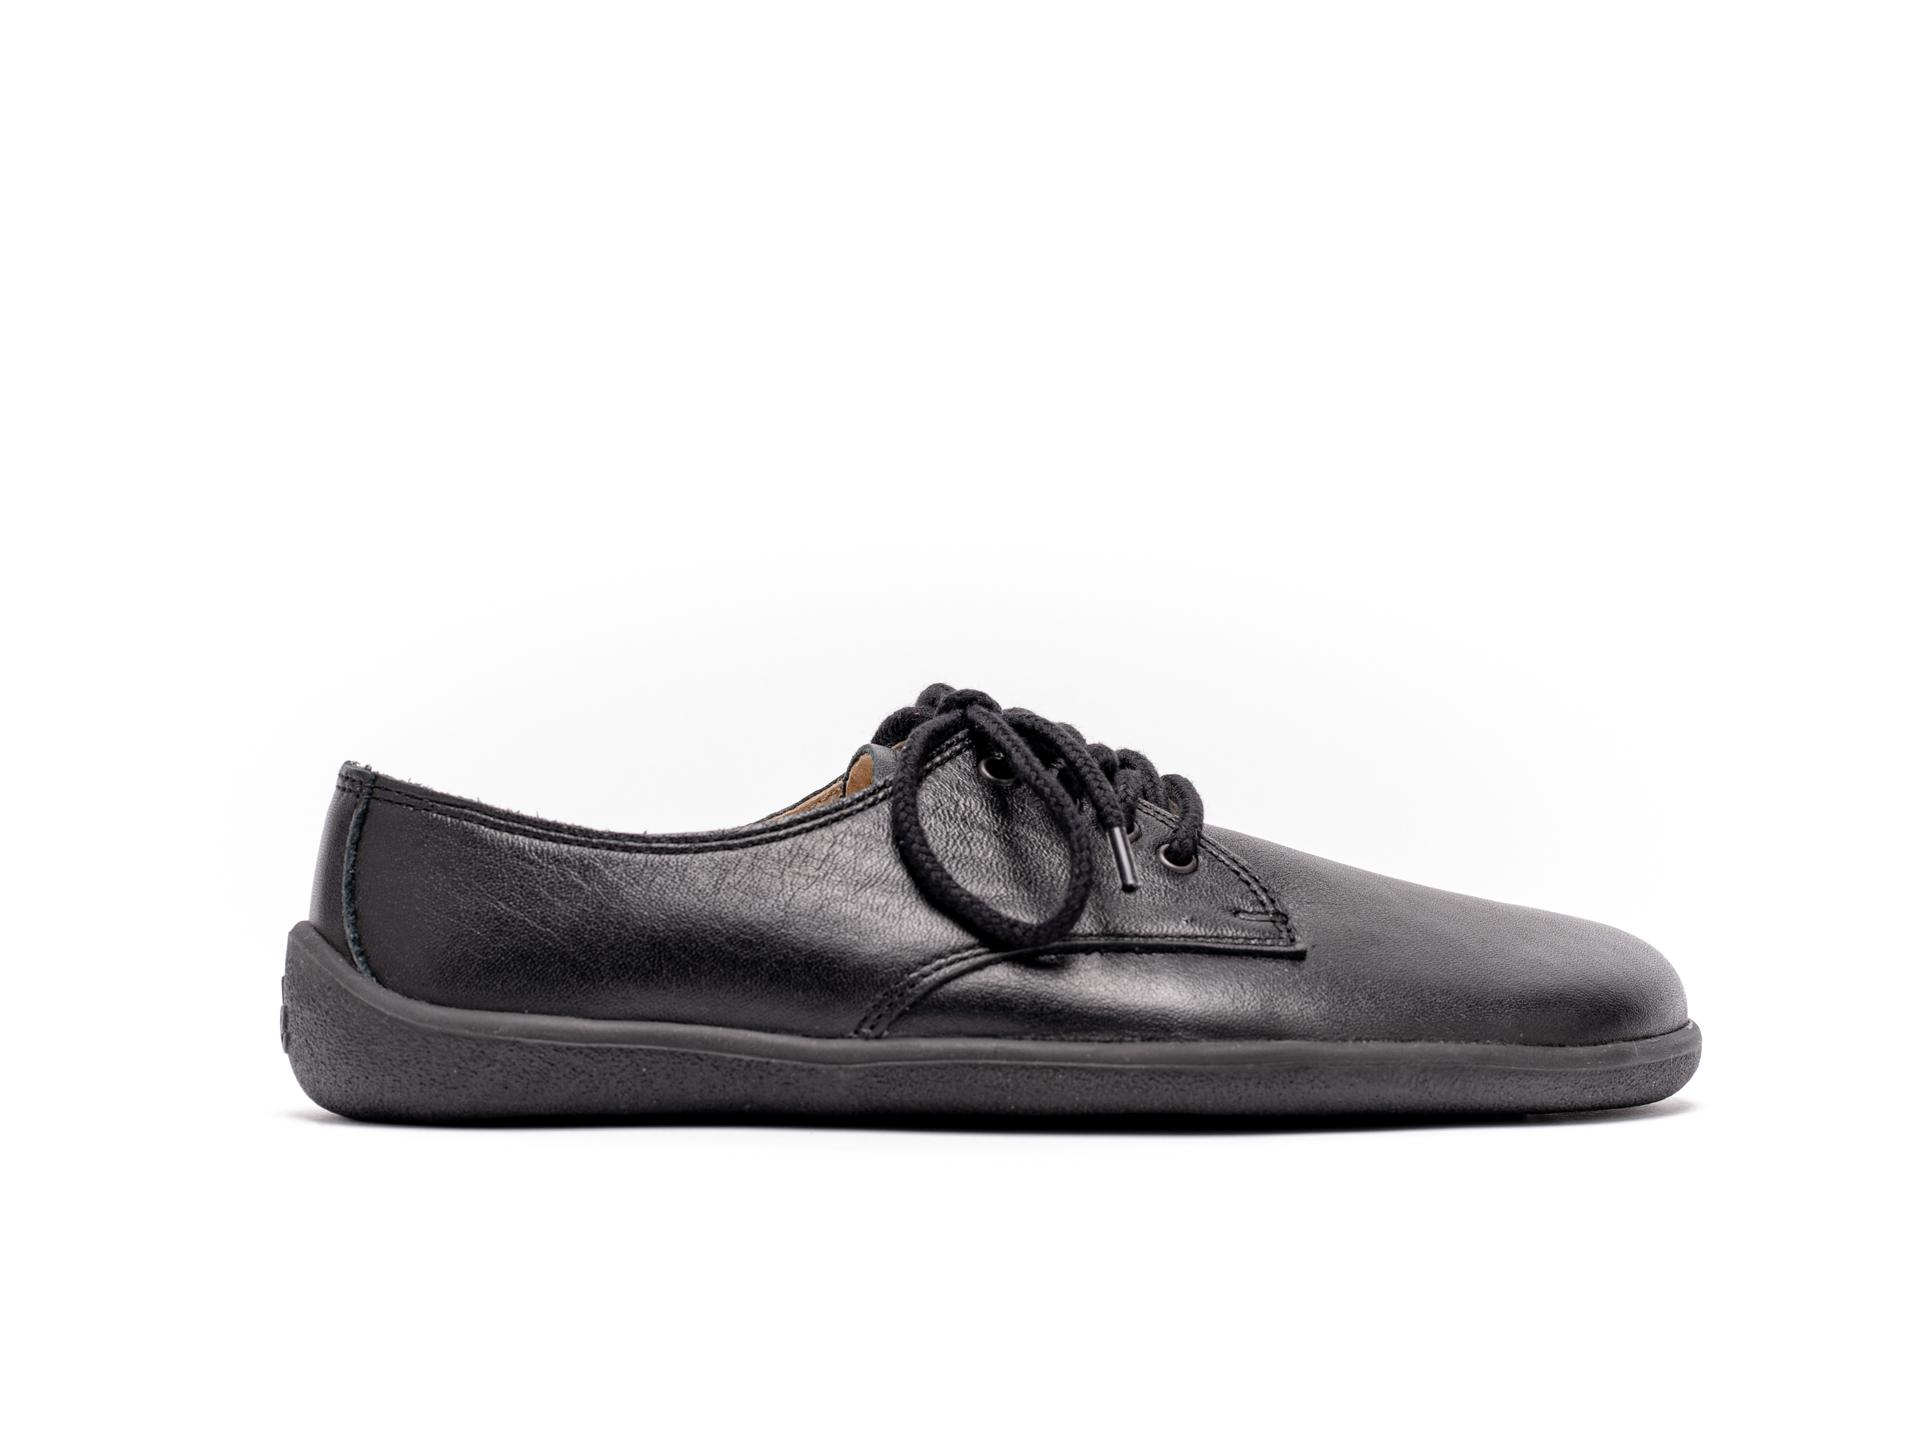 Barefoot Shoes - Be Lenka City - Black 45